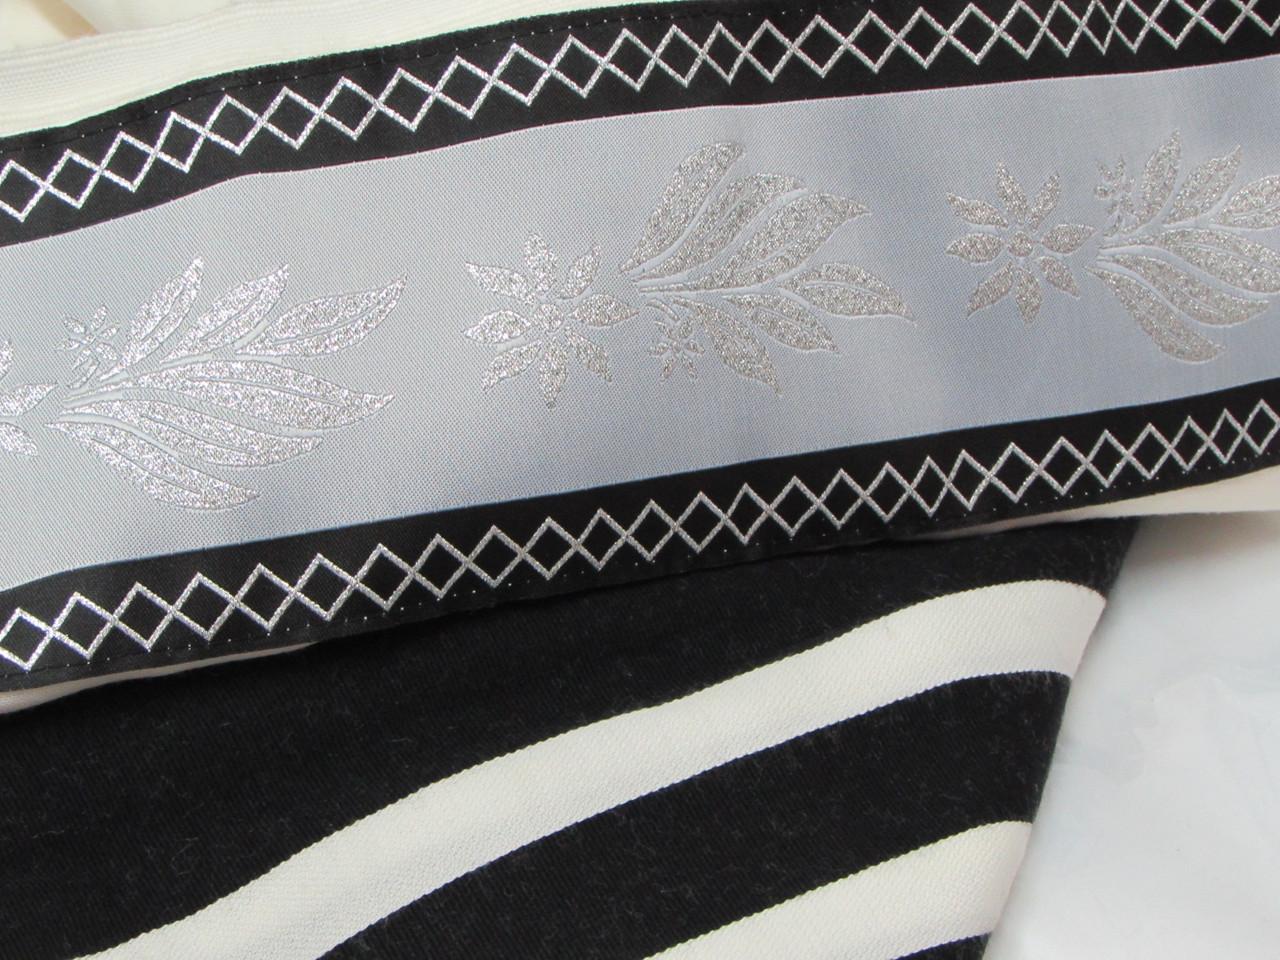 Yemenite Tallit with Black-Silver